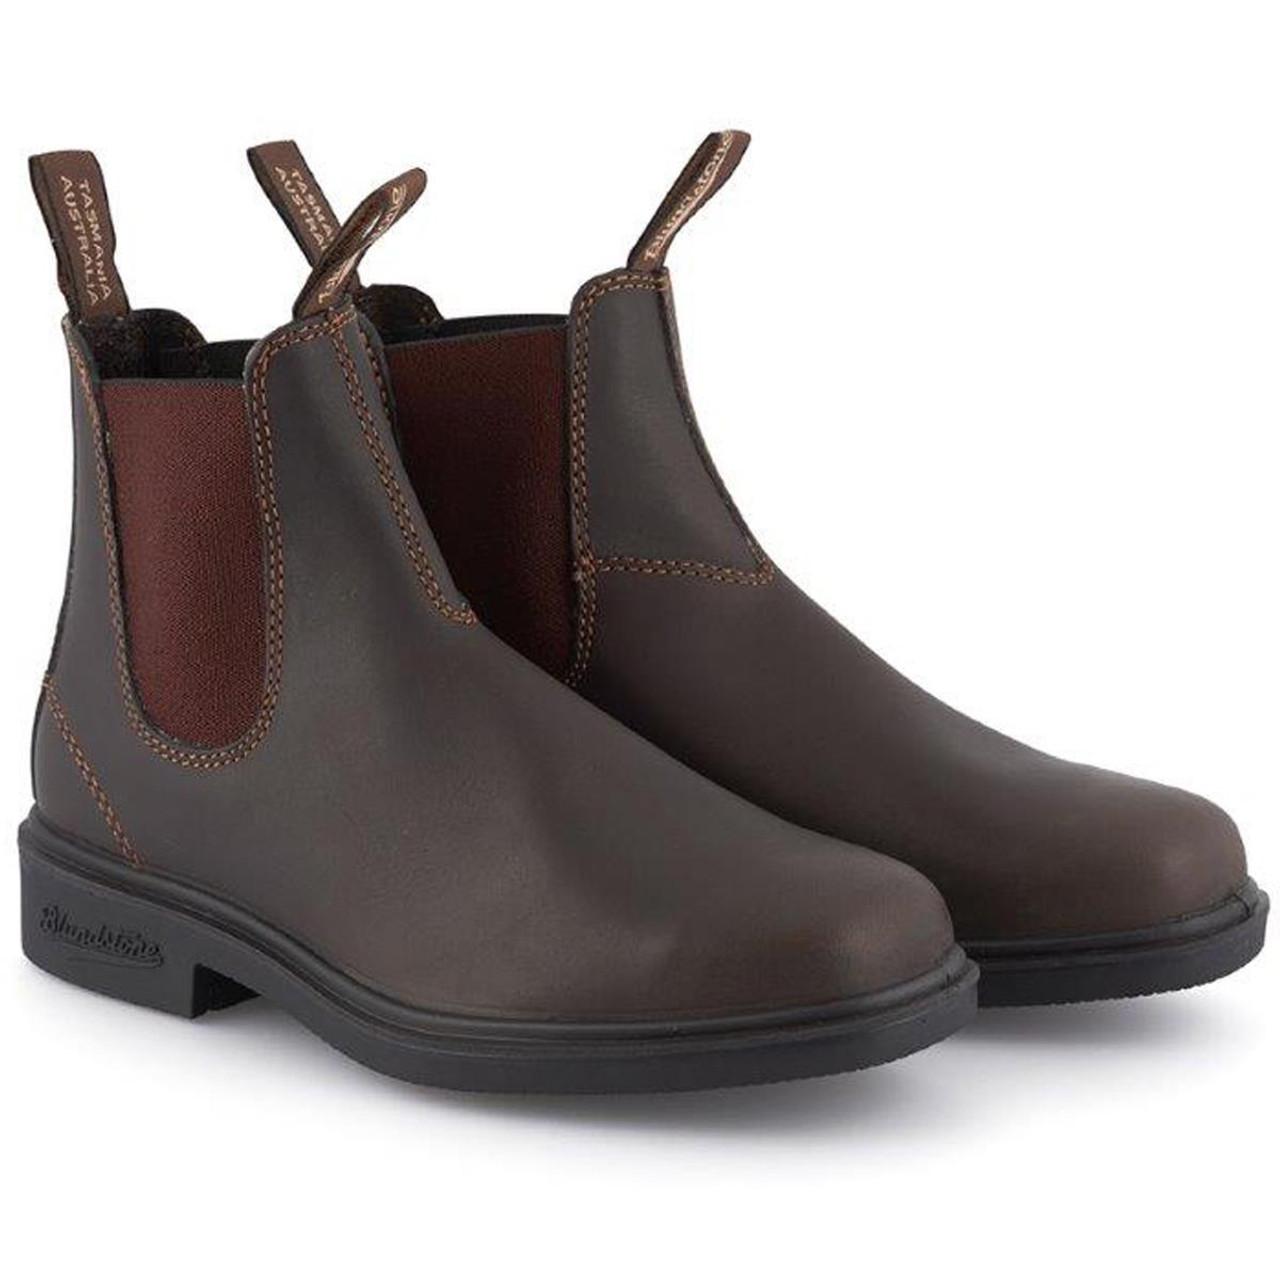 Blundstone Unisex Dress 062 Chelsea Boot